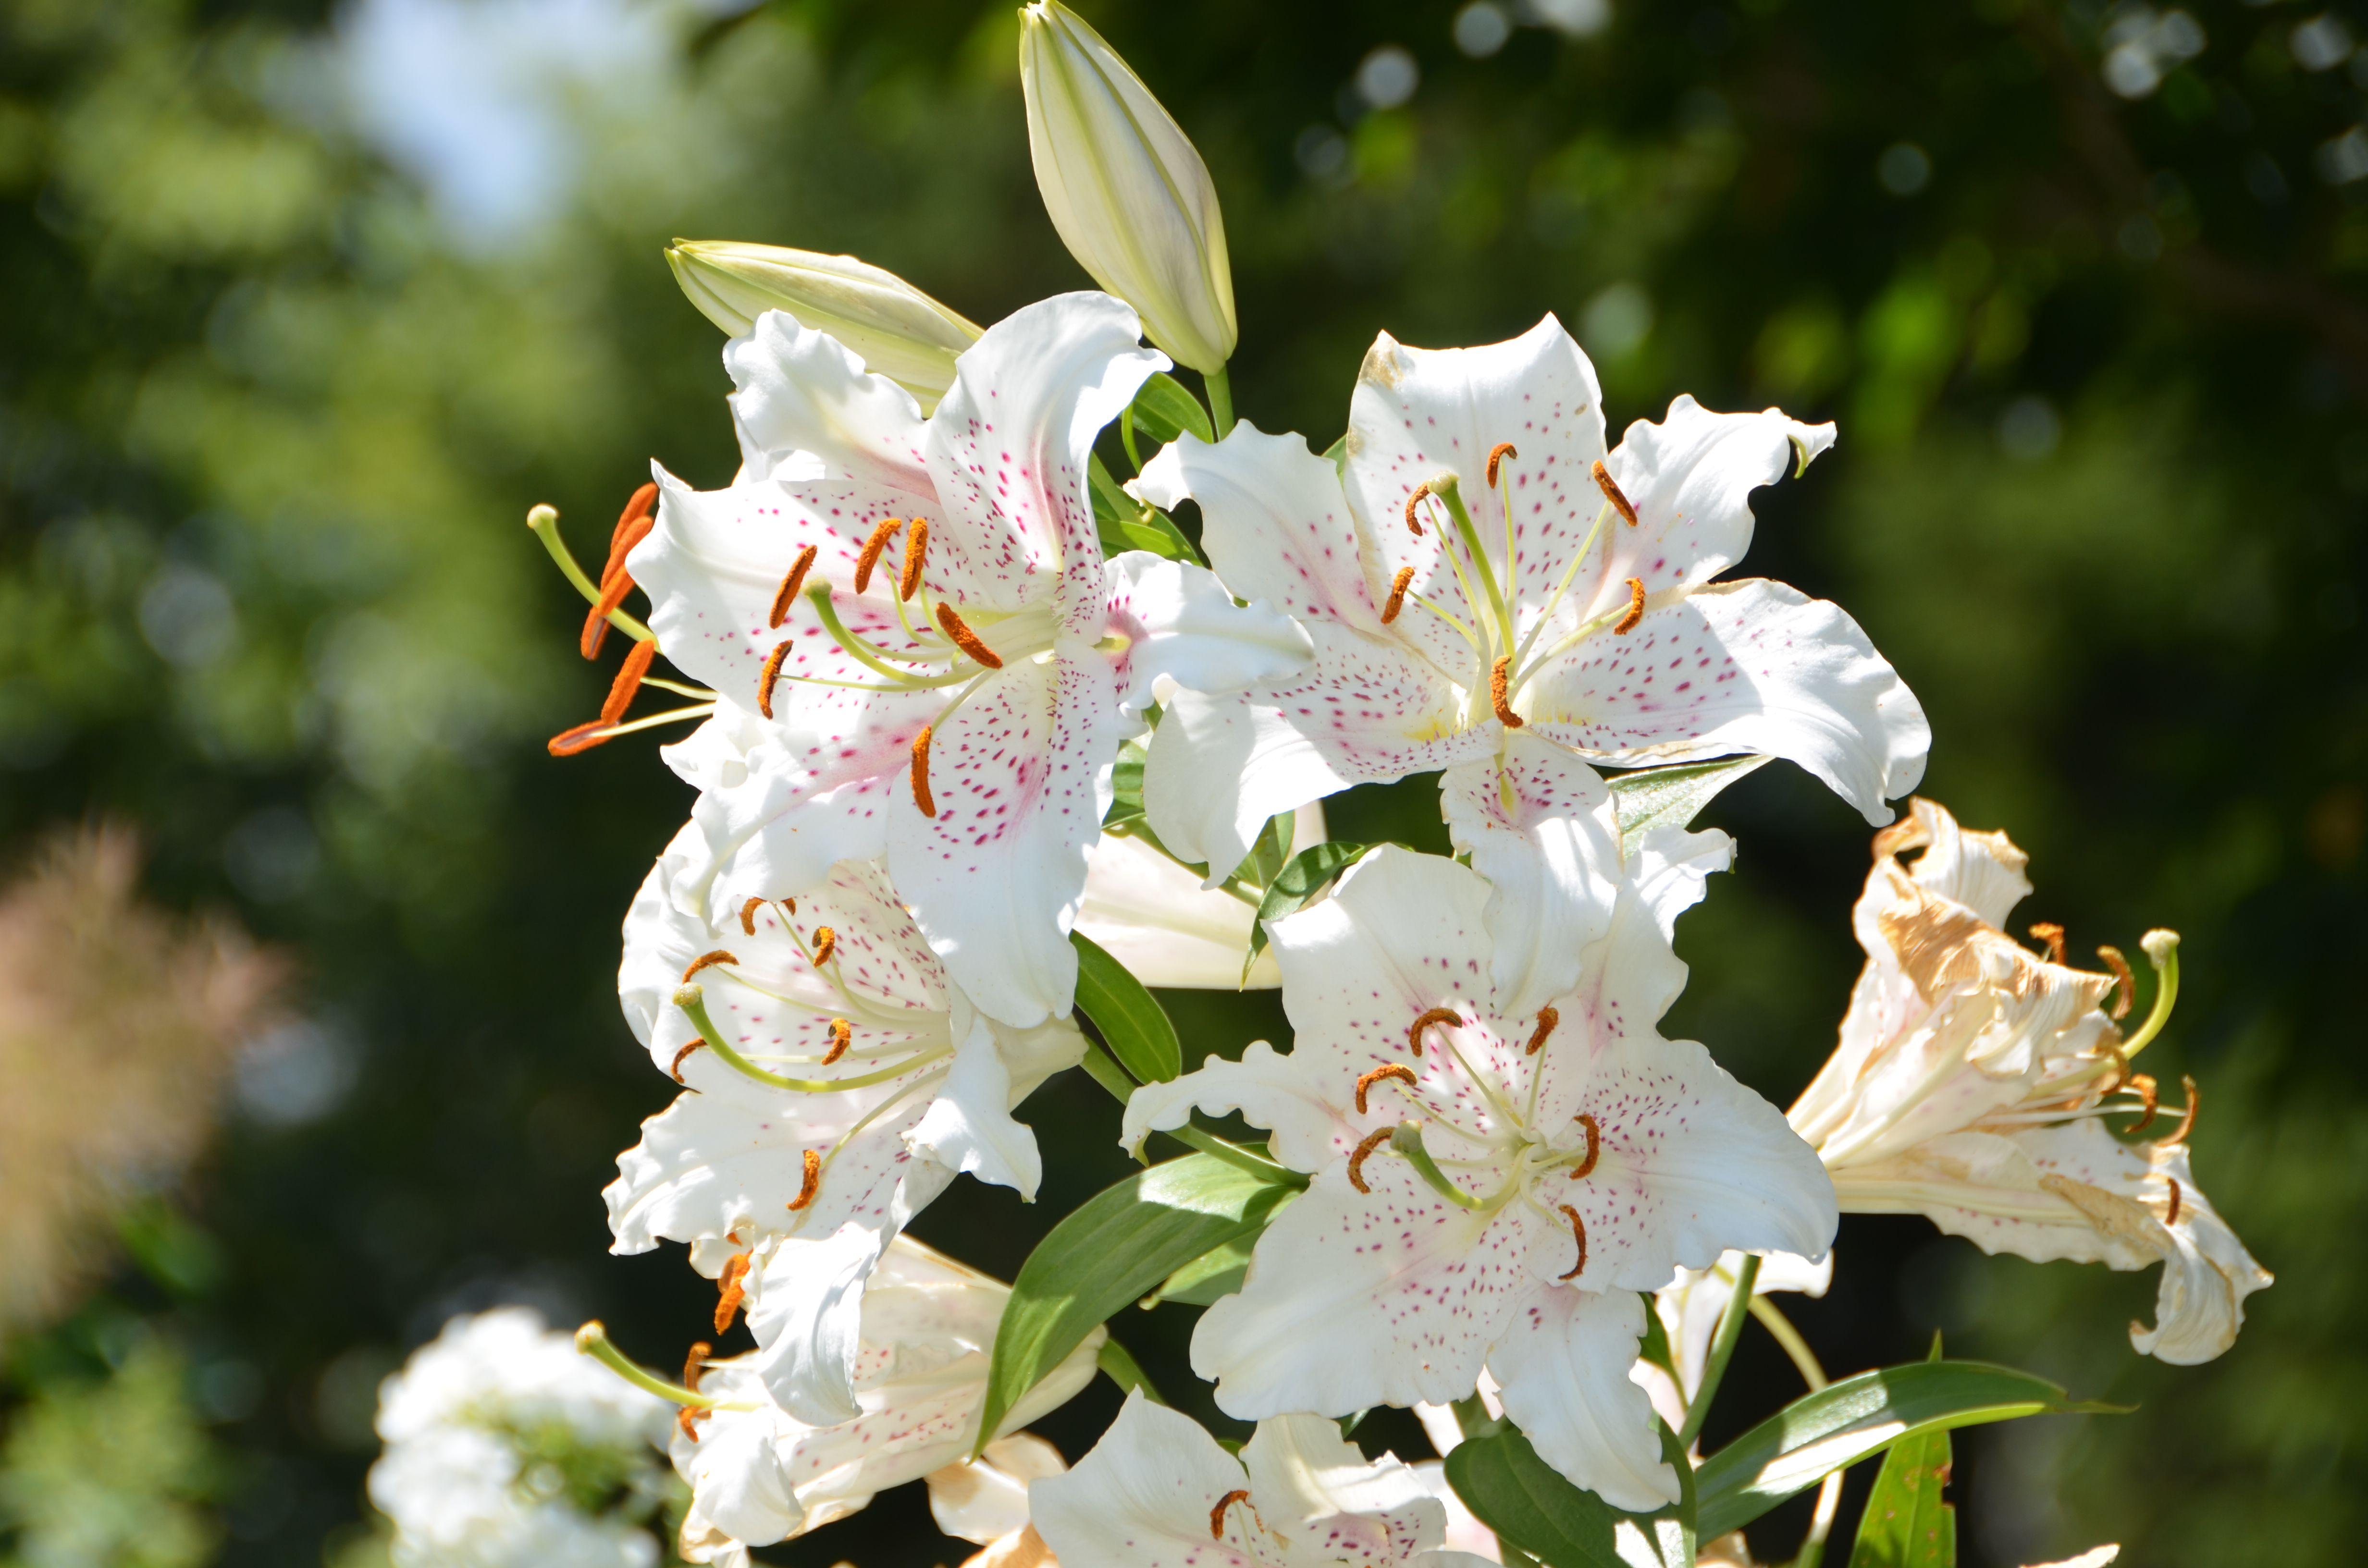 Lilium 'Muscadet' (Oriental Lily) at Coastal Maine Botanical Gardens.